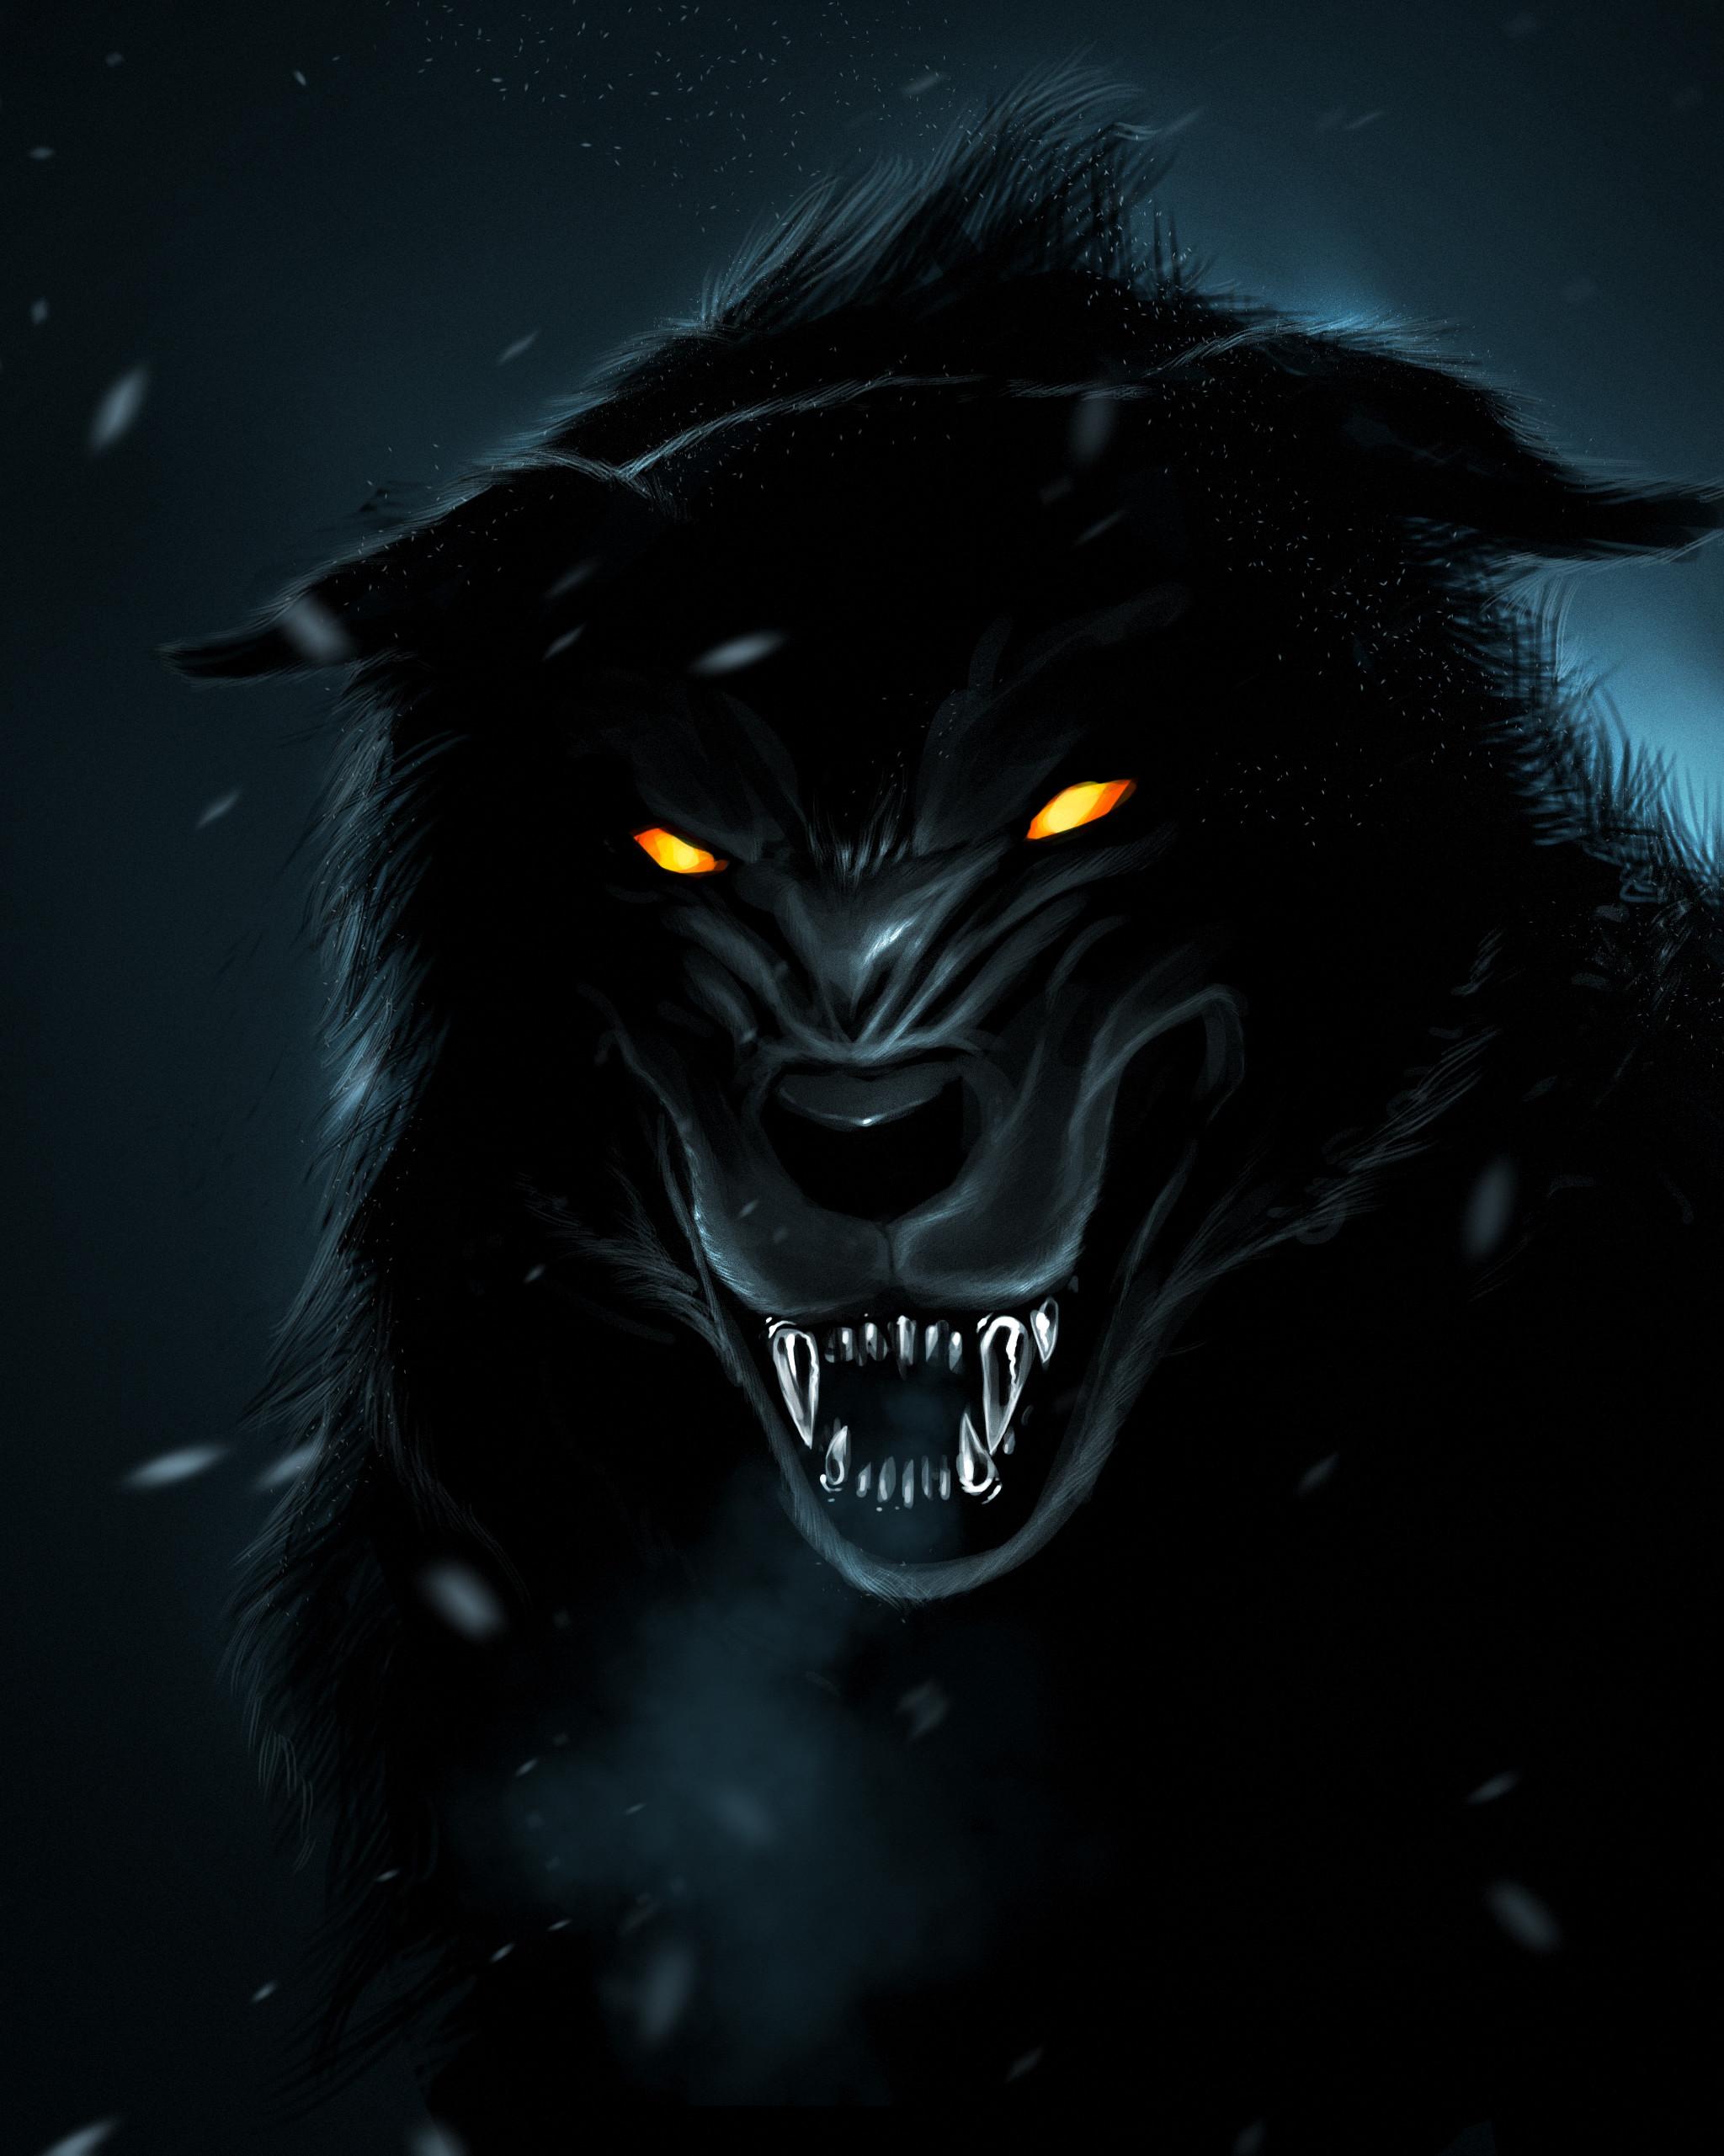 #hd #fantasy #horror #animal #wallpapers #background #walls #screen